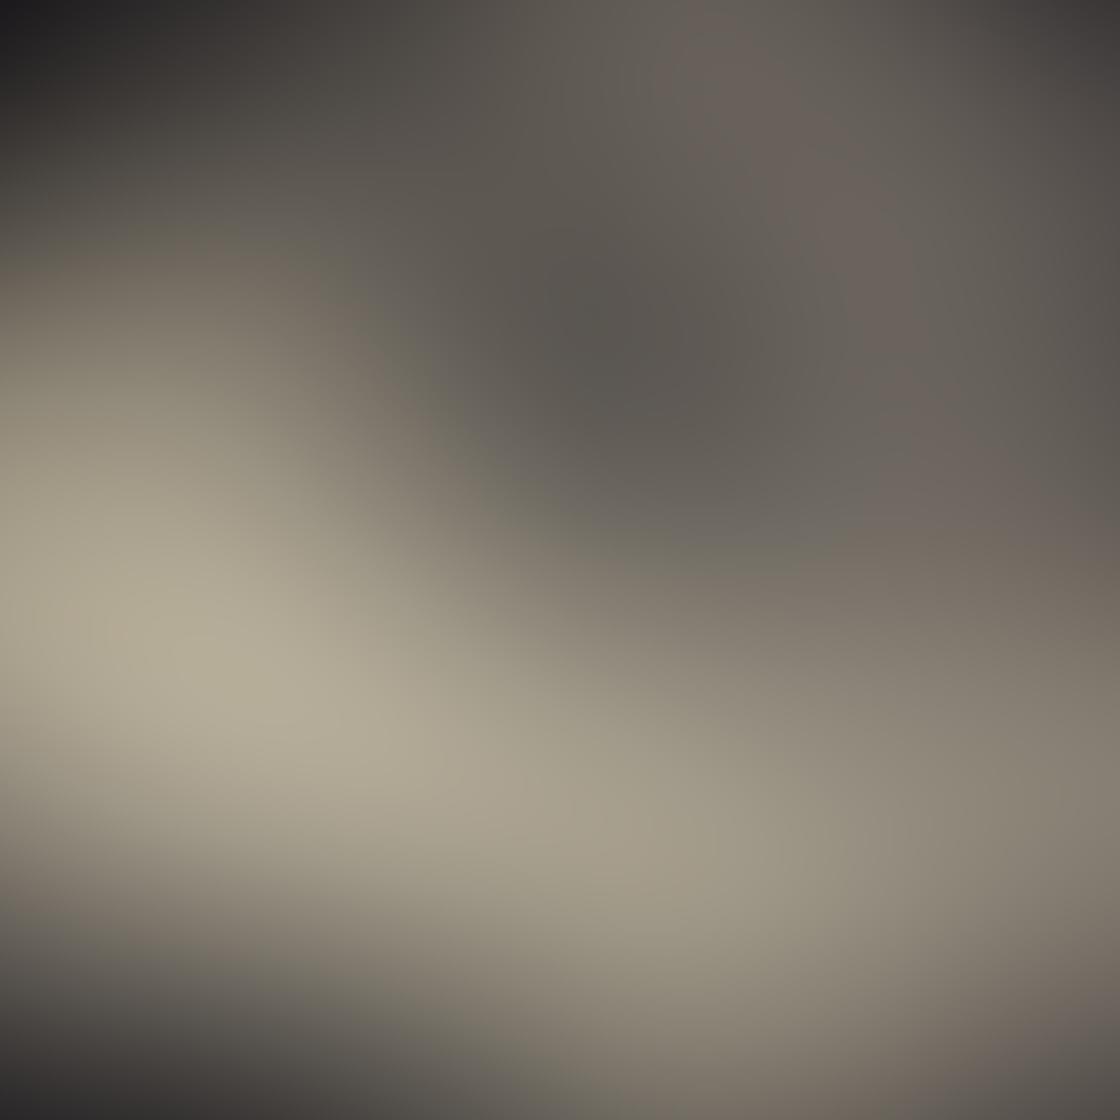 Elements Of Good iPhone Photo 5